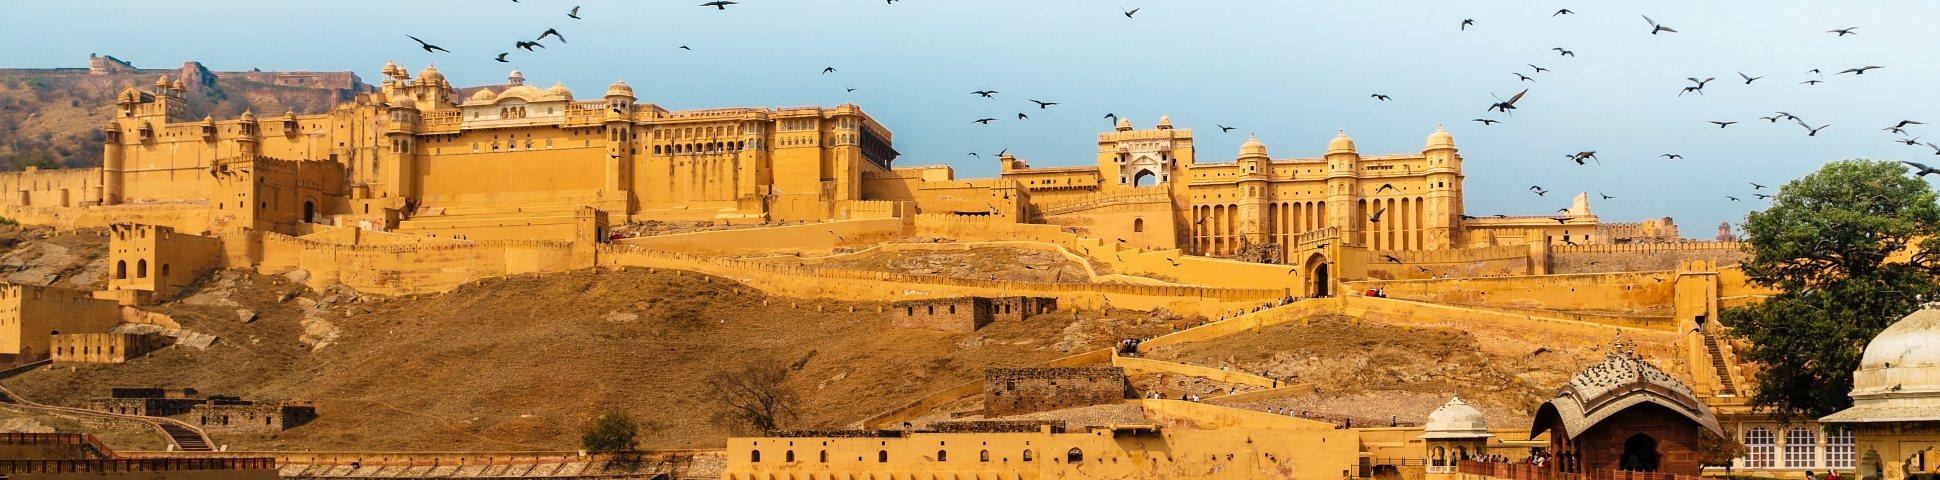 Beautiful buildings in Rajasthan